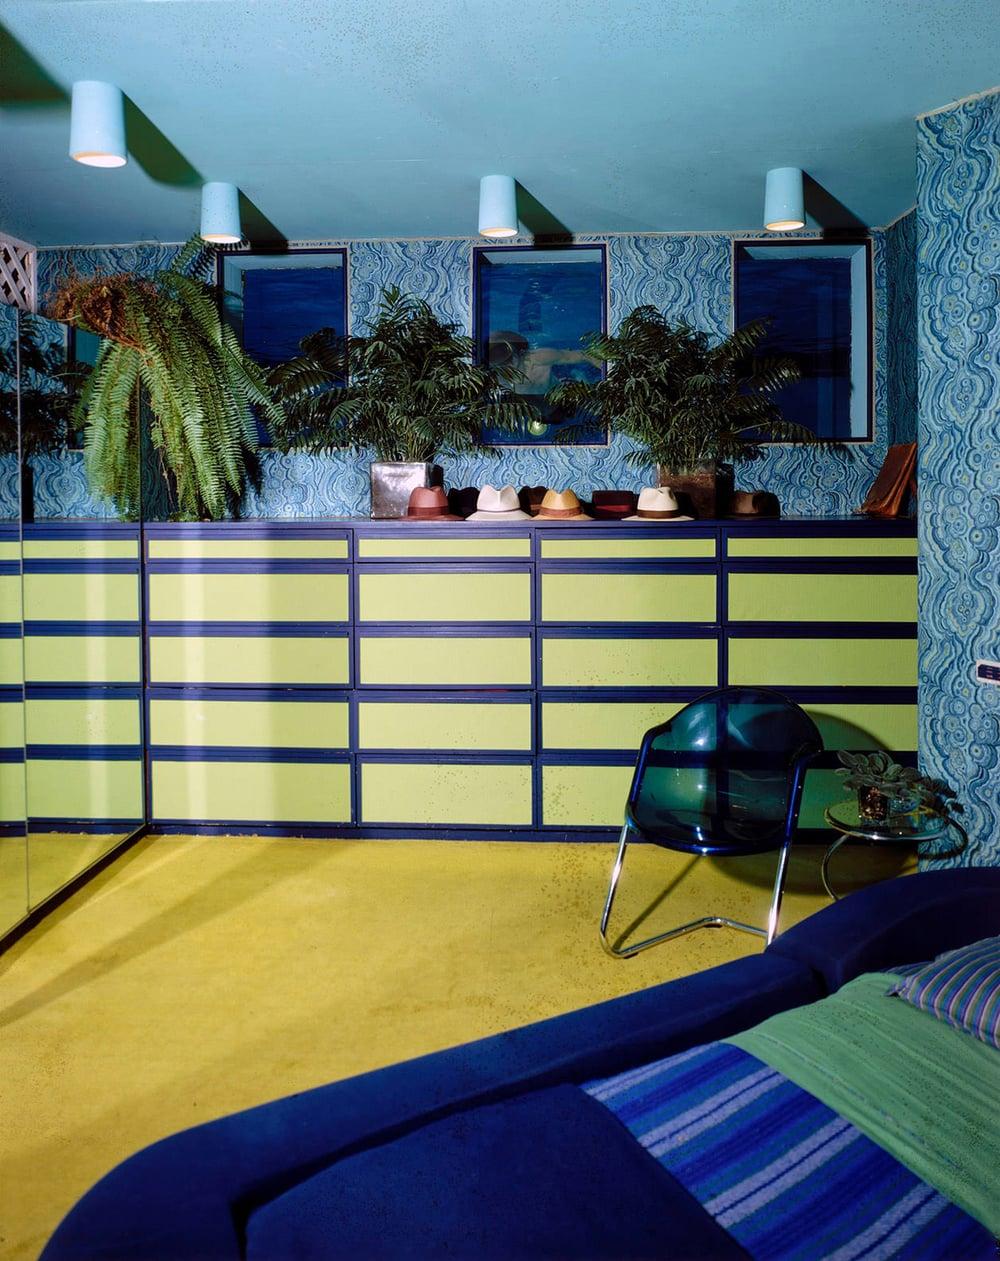 1980_Sheats_Goldstein_Residence_interior.jpg